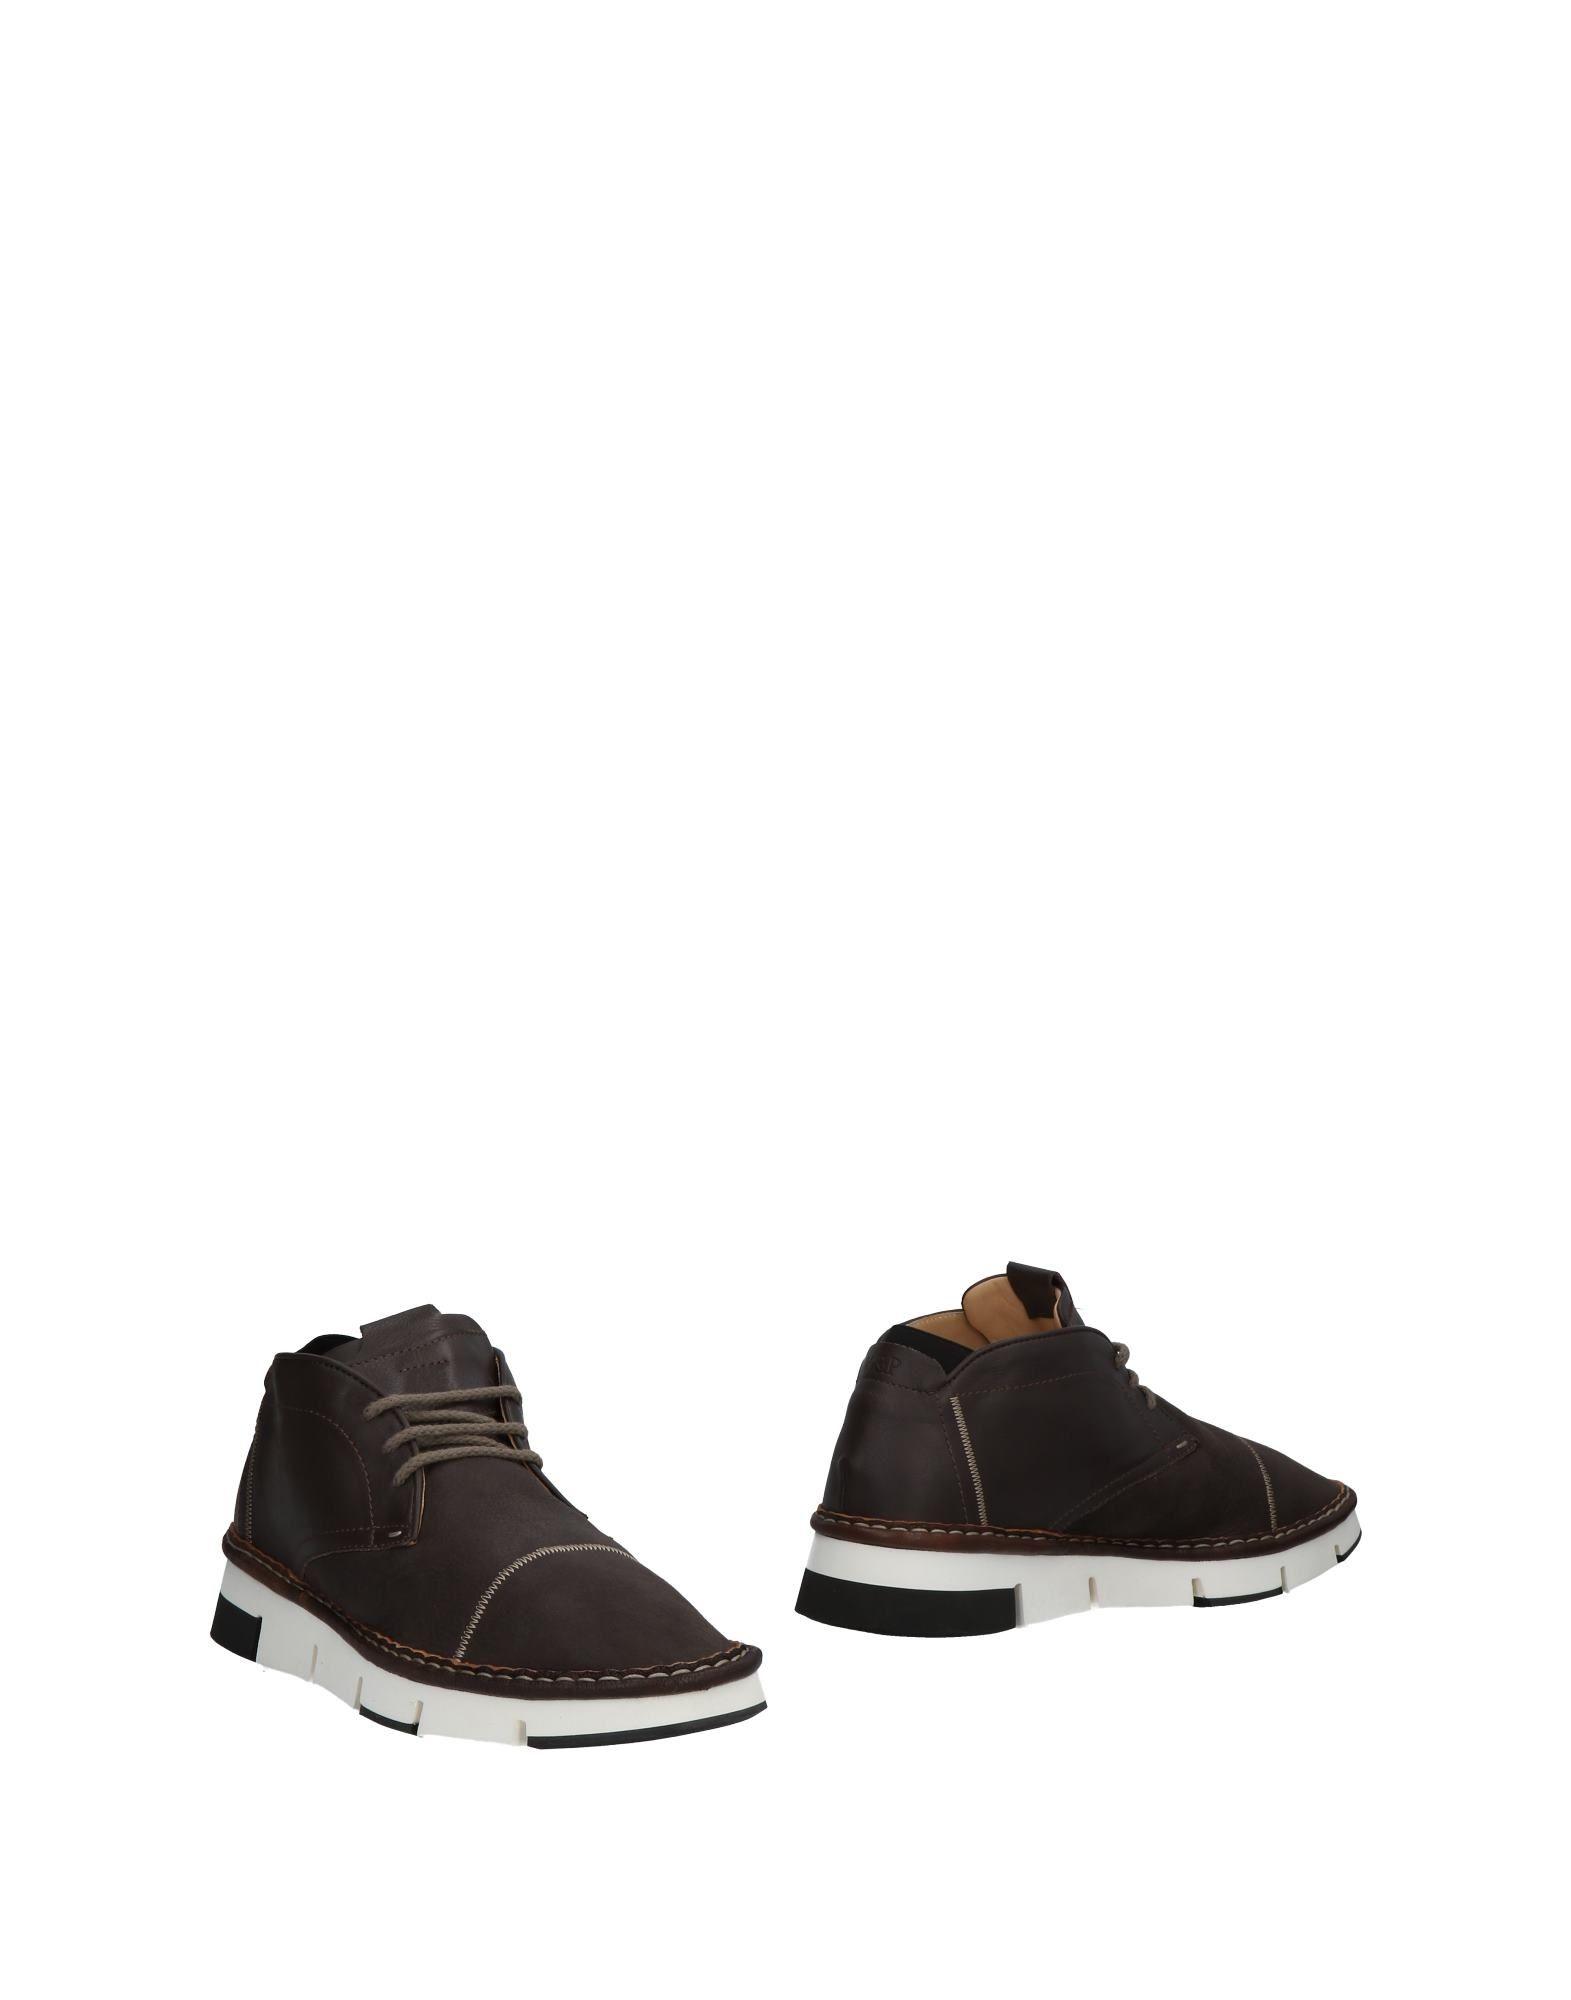 WATSON & PARKER Полусапоги и высокие ботинки newman scott watson dawn english download [a1] wb